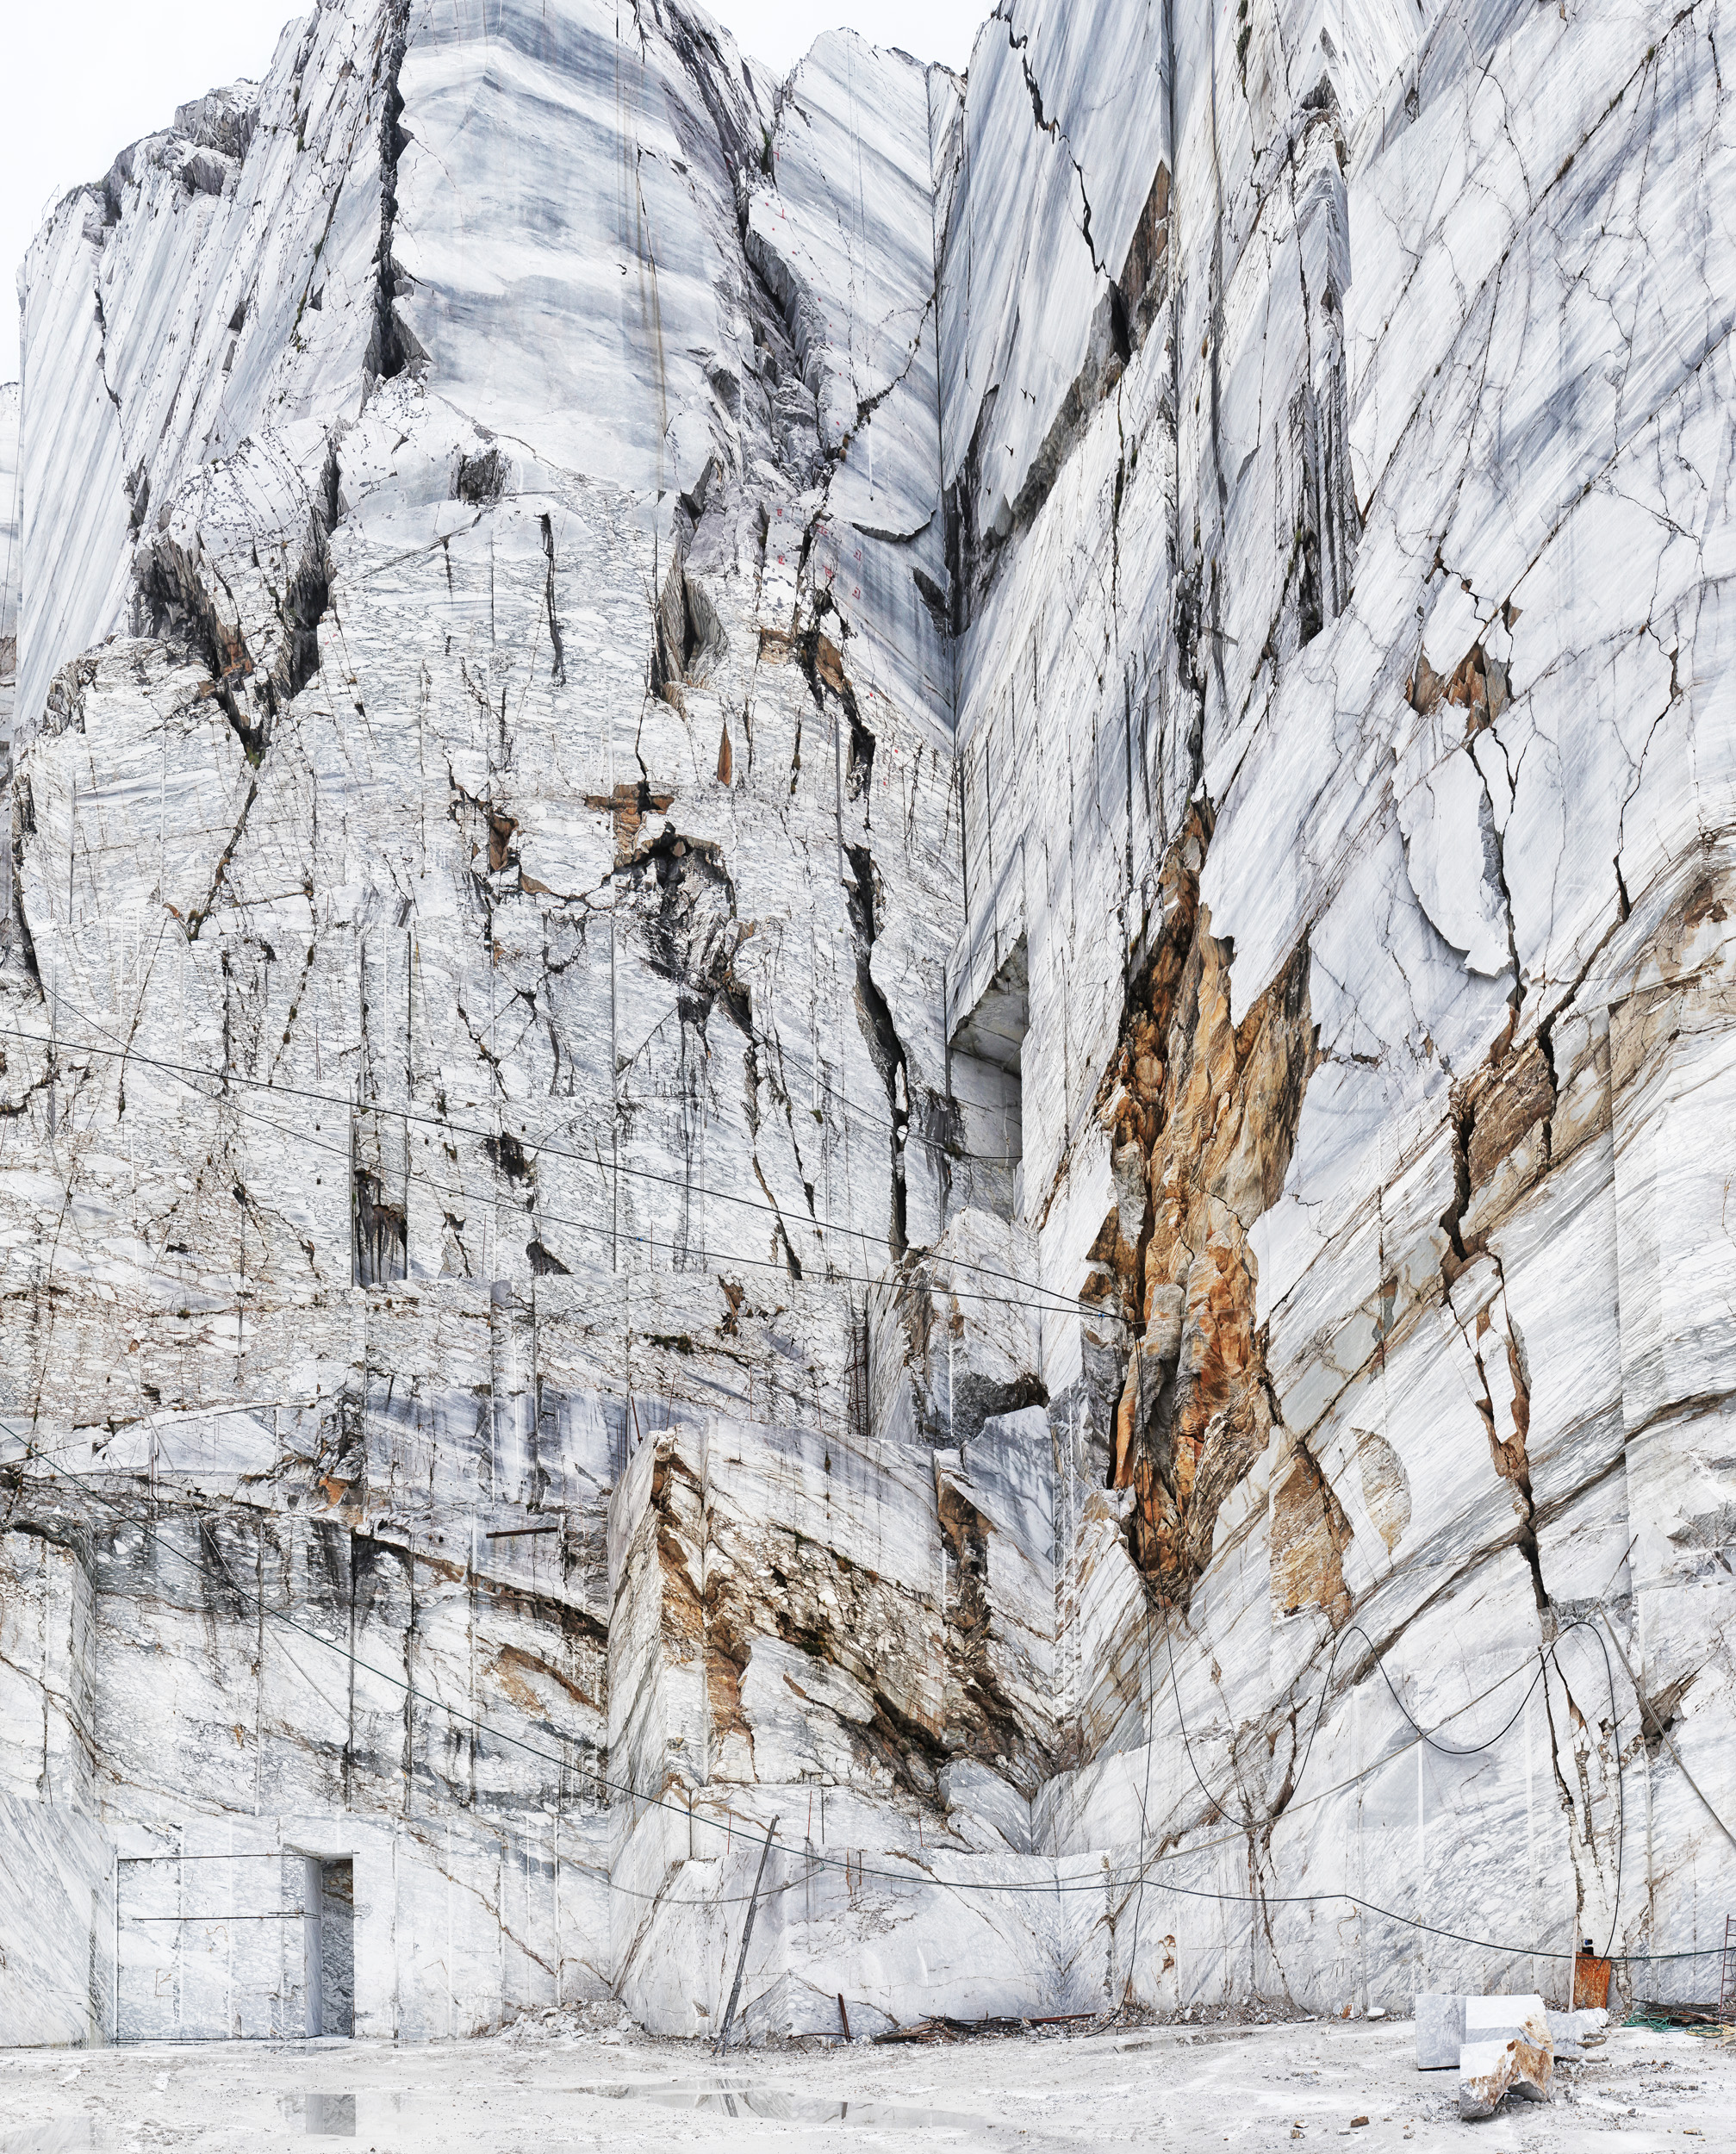 Tavolini II - Carrara, Italy 2015